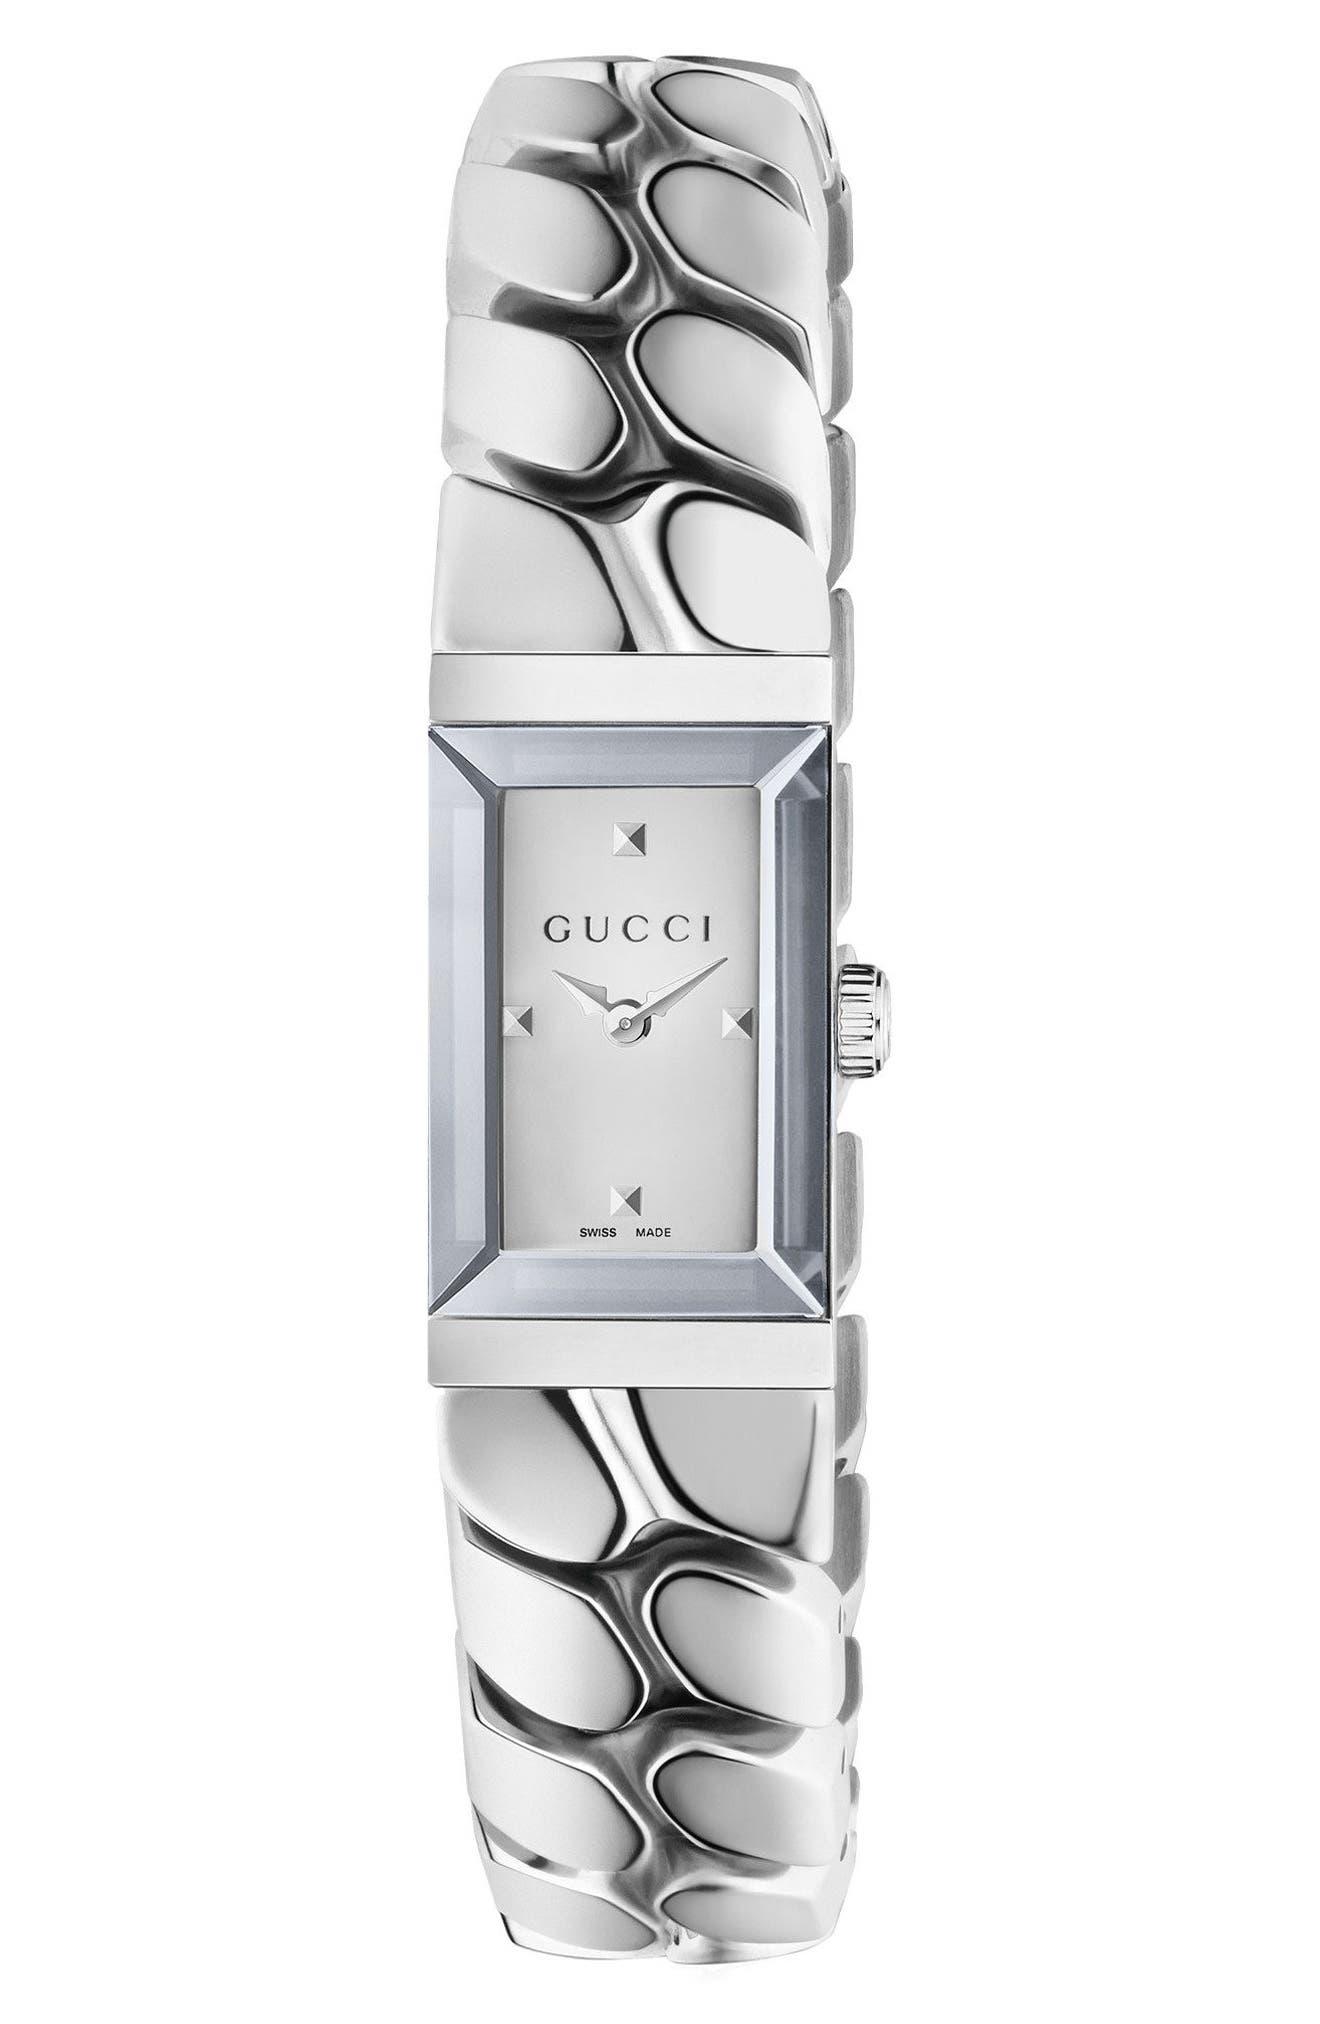 Image of GUCCI Women's G-Frame Gourmette Chain Bracelet Watch, 14mm